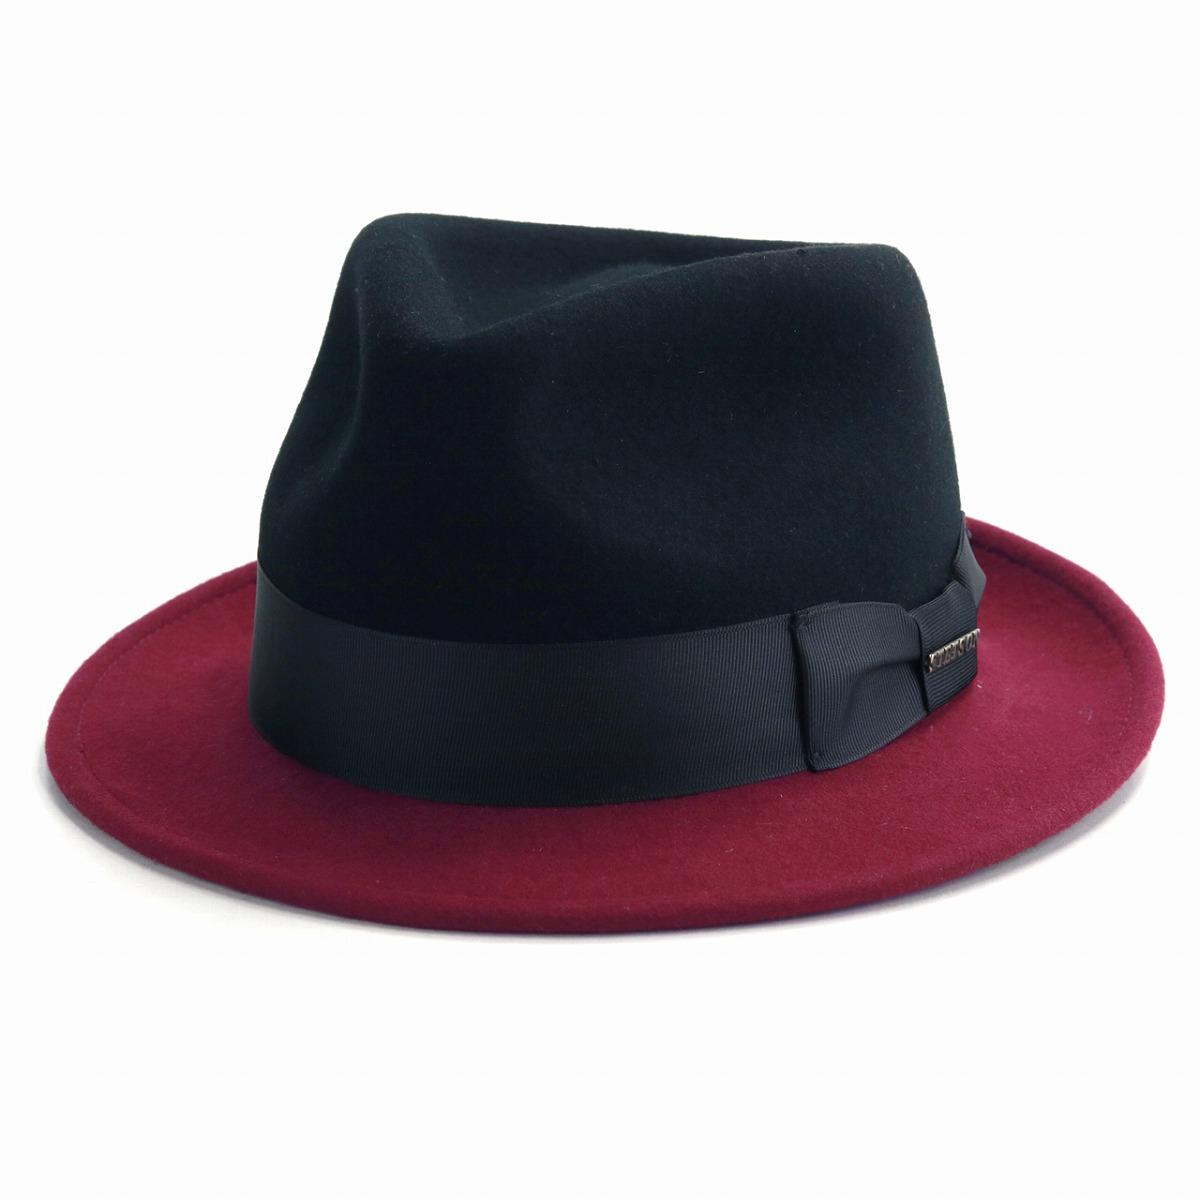 2 soft felt hat hat hat hat men tone color STETSON import hats felt hat men  wool Stetson black   bar Gandhi  fedora  stetson hat mail order man hat  present ... 10d3f0d291e